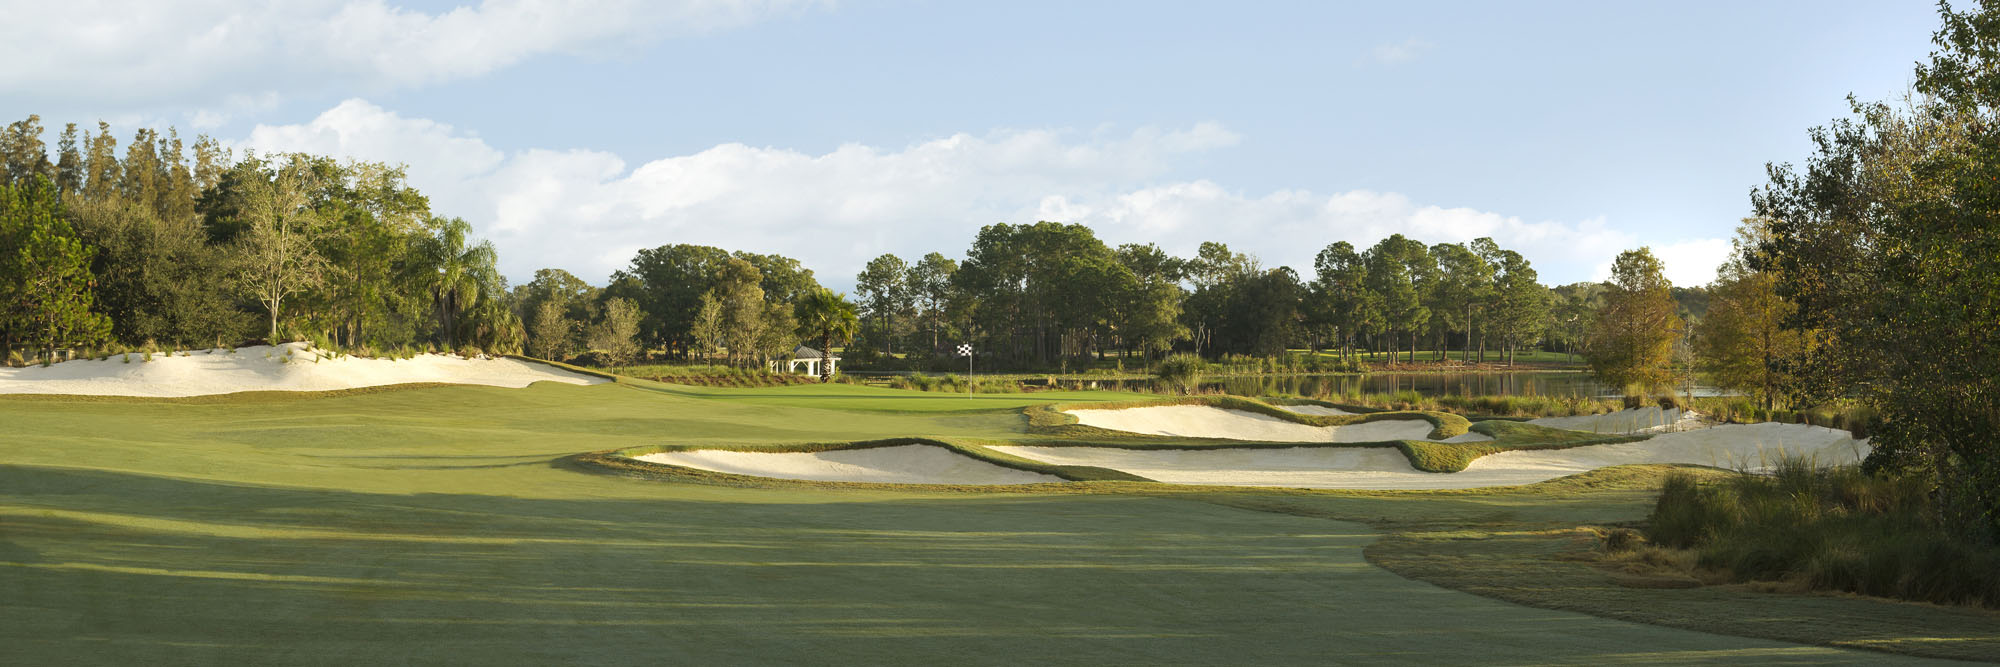 Old Memorial Golf Club